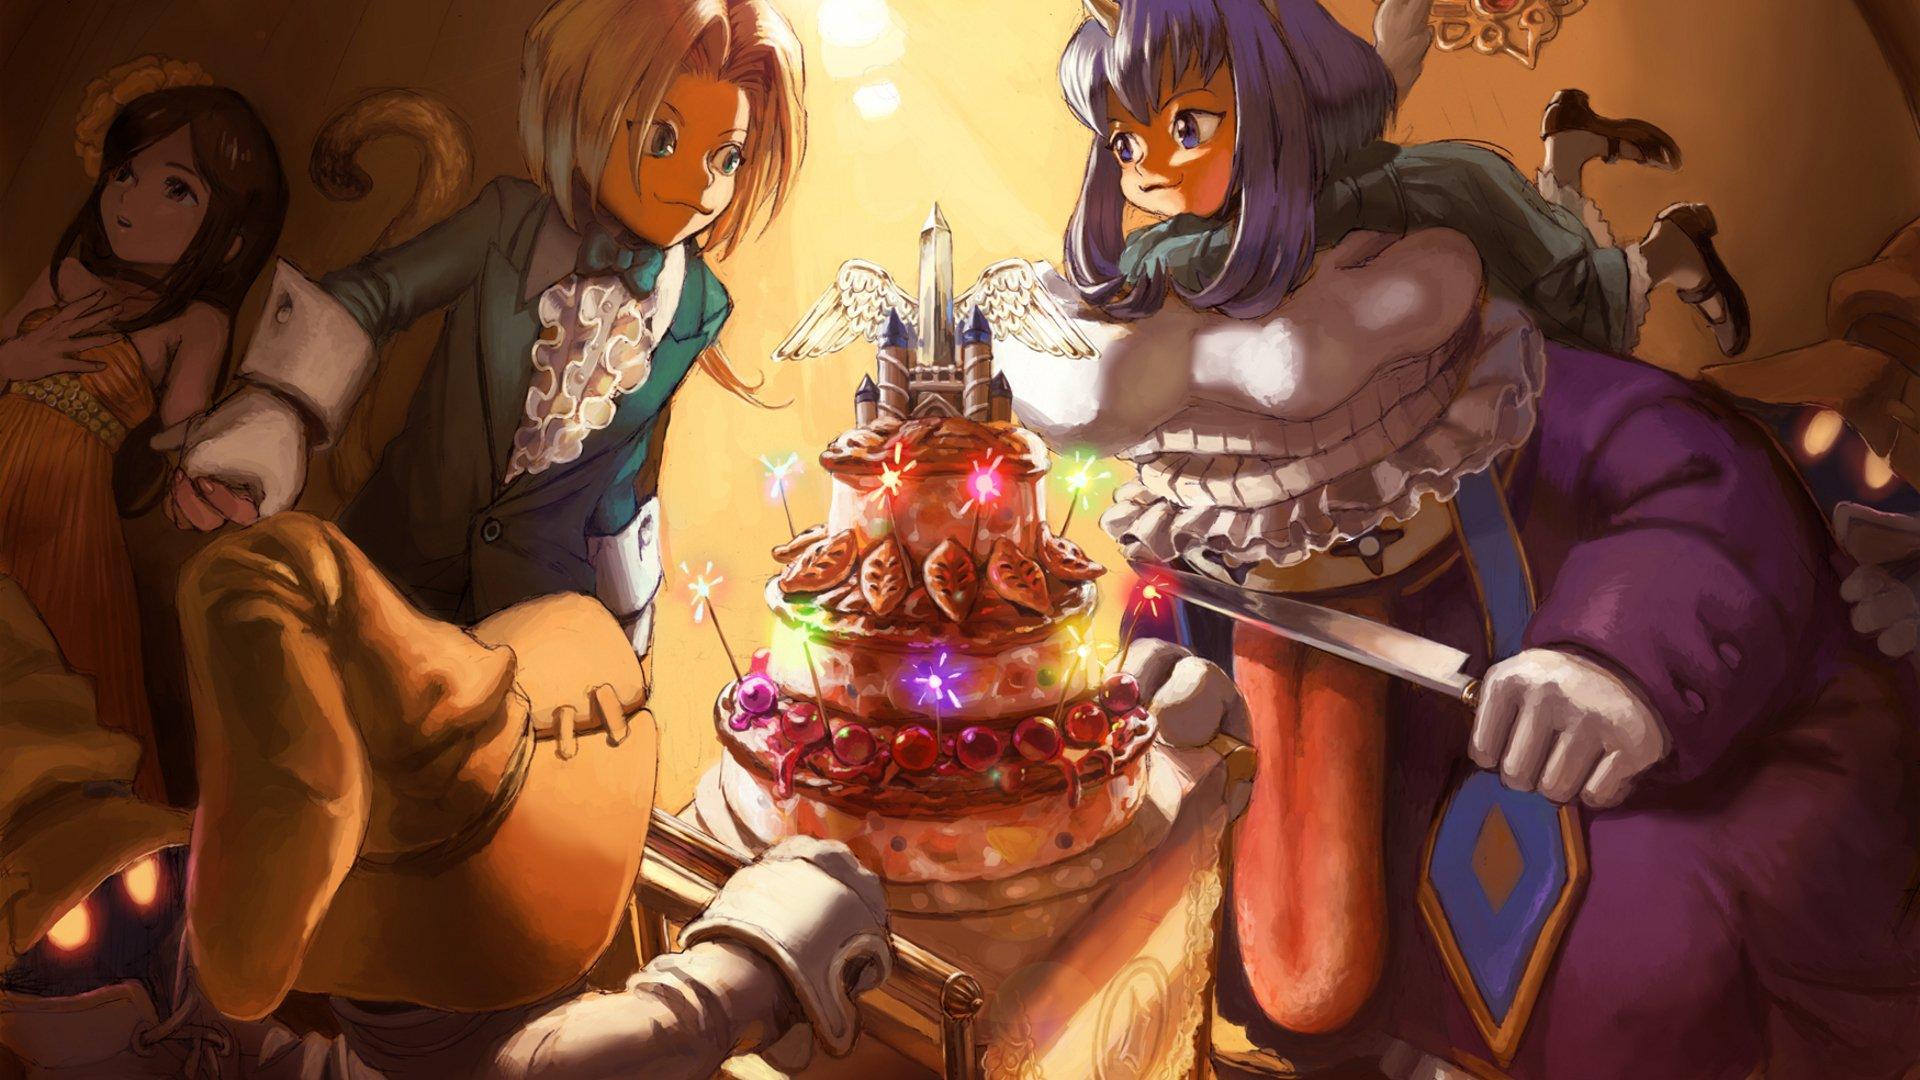 Final Fantasy Ix Fondo De Pantalla Hd Fondo De Escritorio